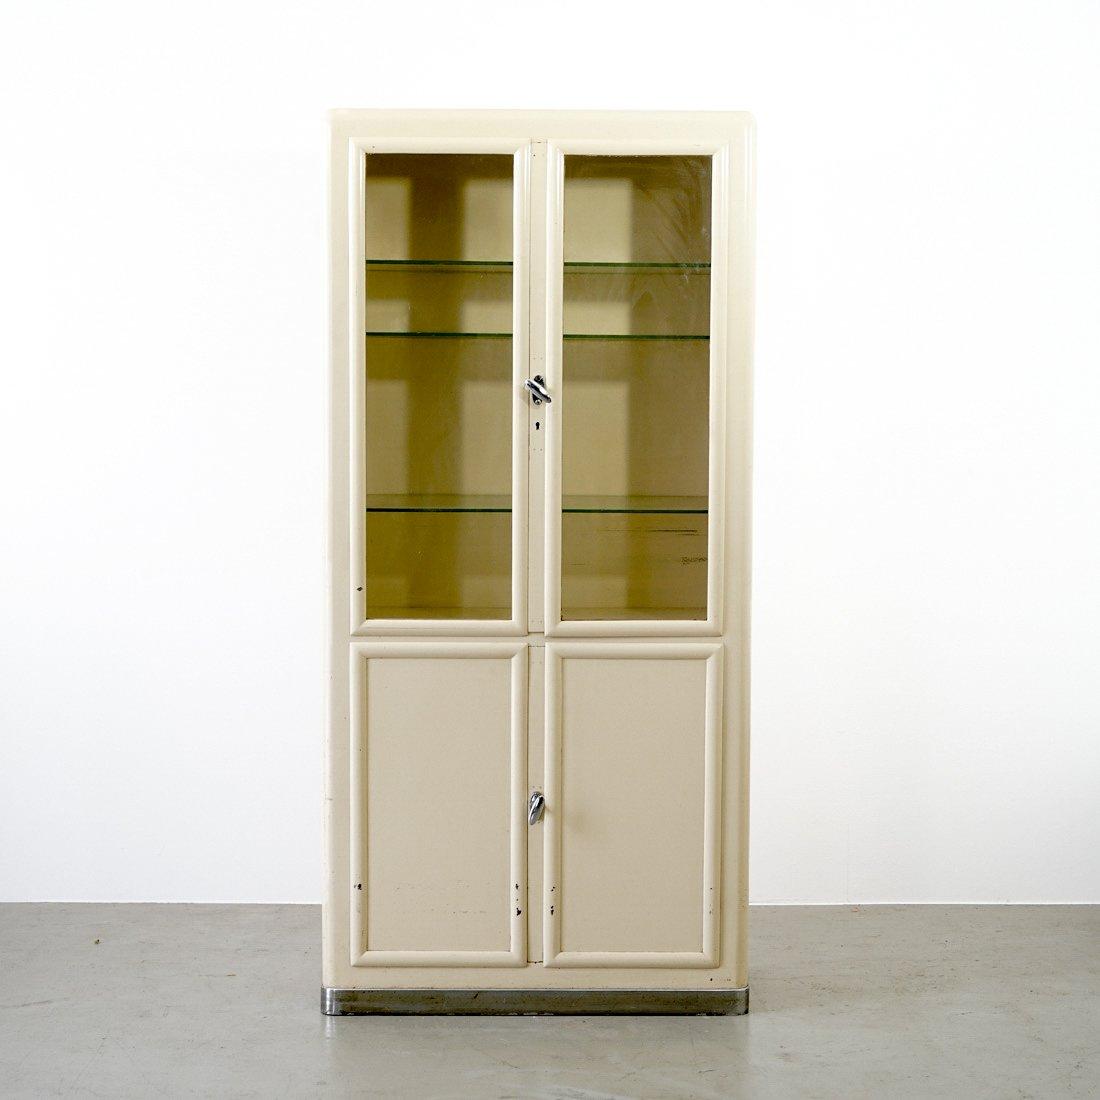 Vintage Cream Metal & Glass Medicine Cabinet - Vintage Cream Metal & Glass Medicine Cabinet For Sale At Pamono